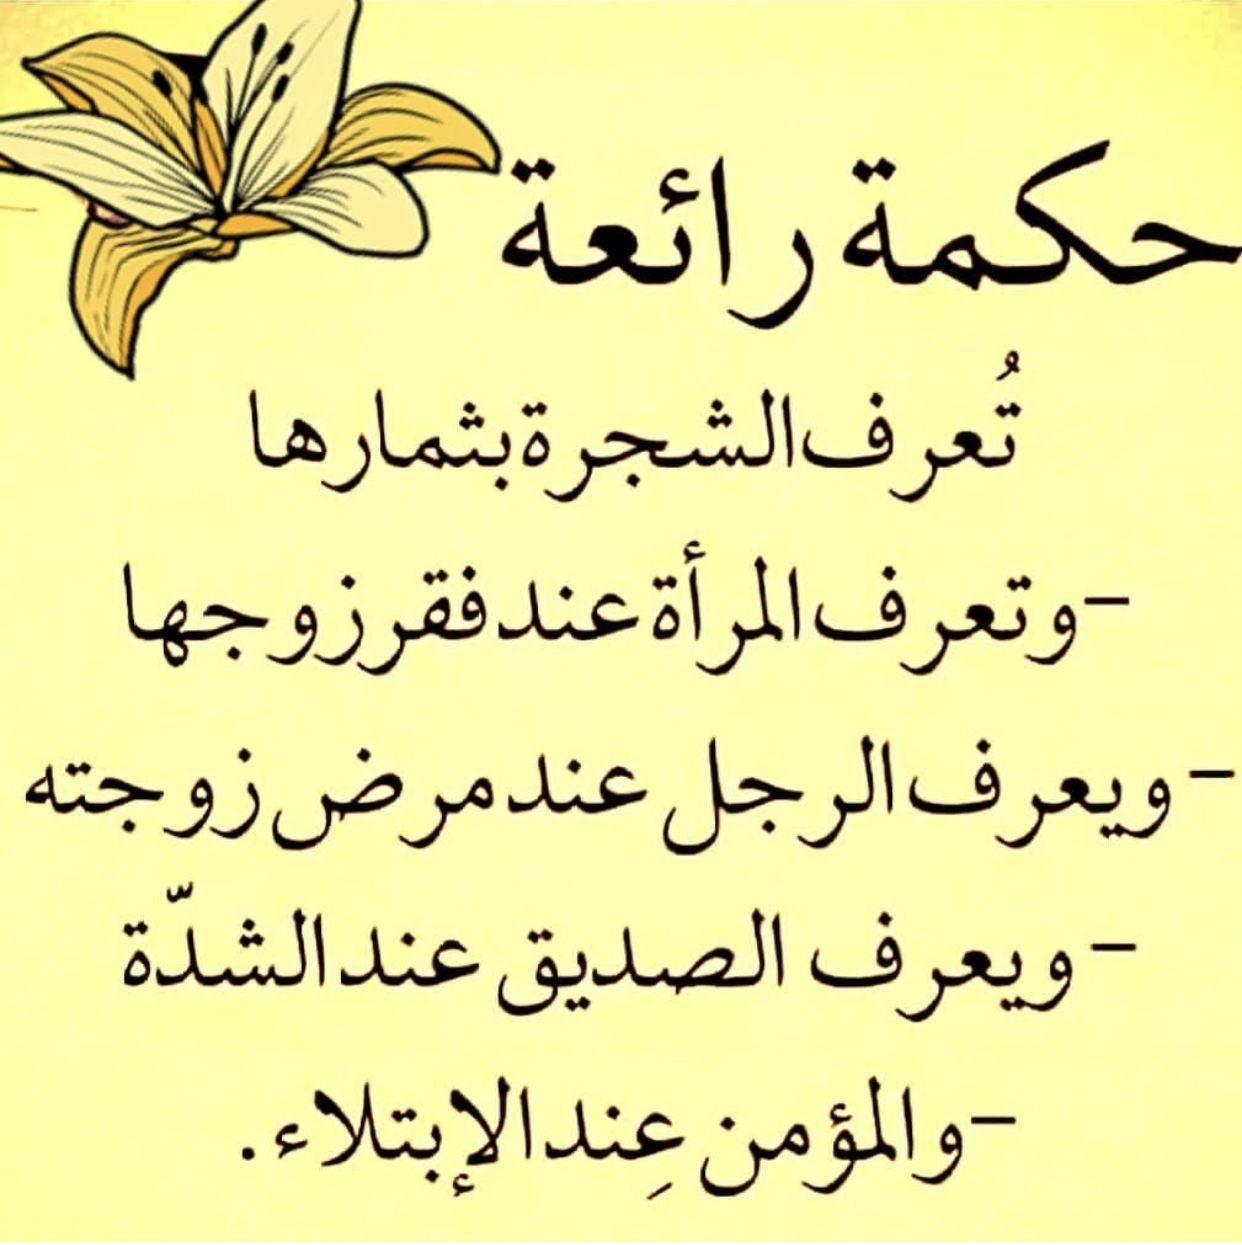 Pin By Muath Crystal On رمزيات Arabic Calligraphy Calligraphy